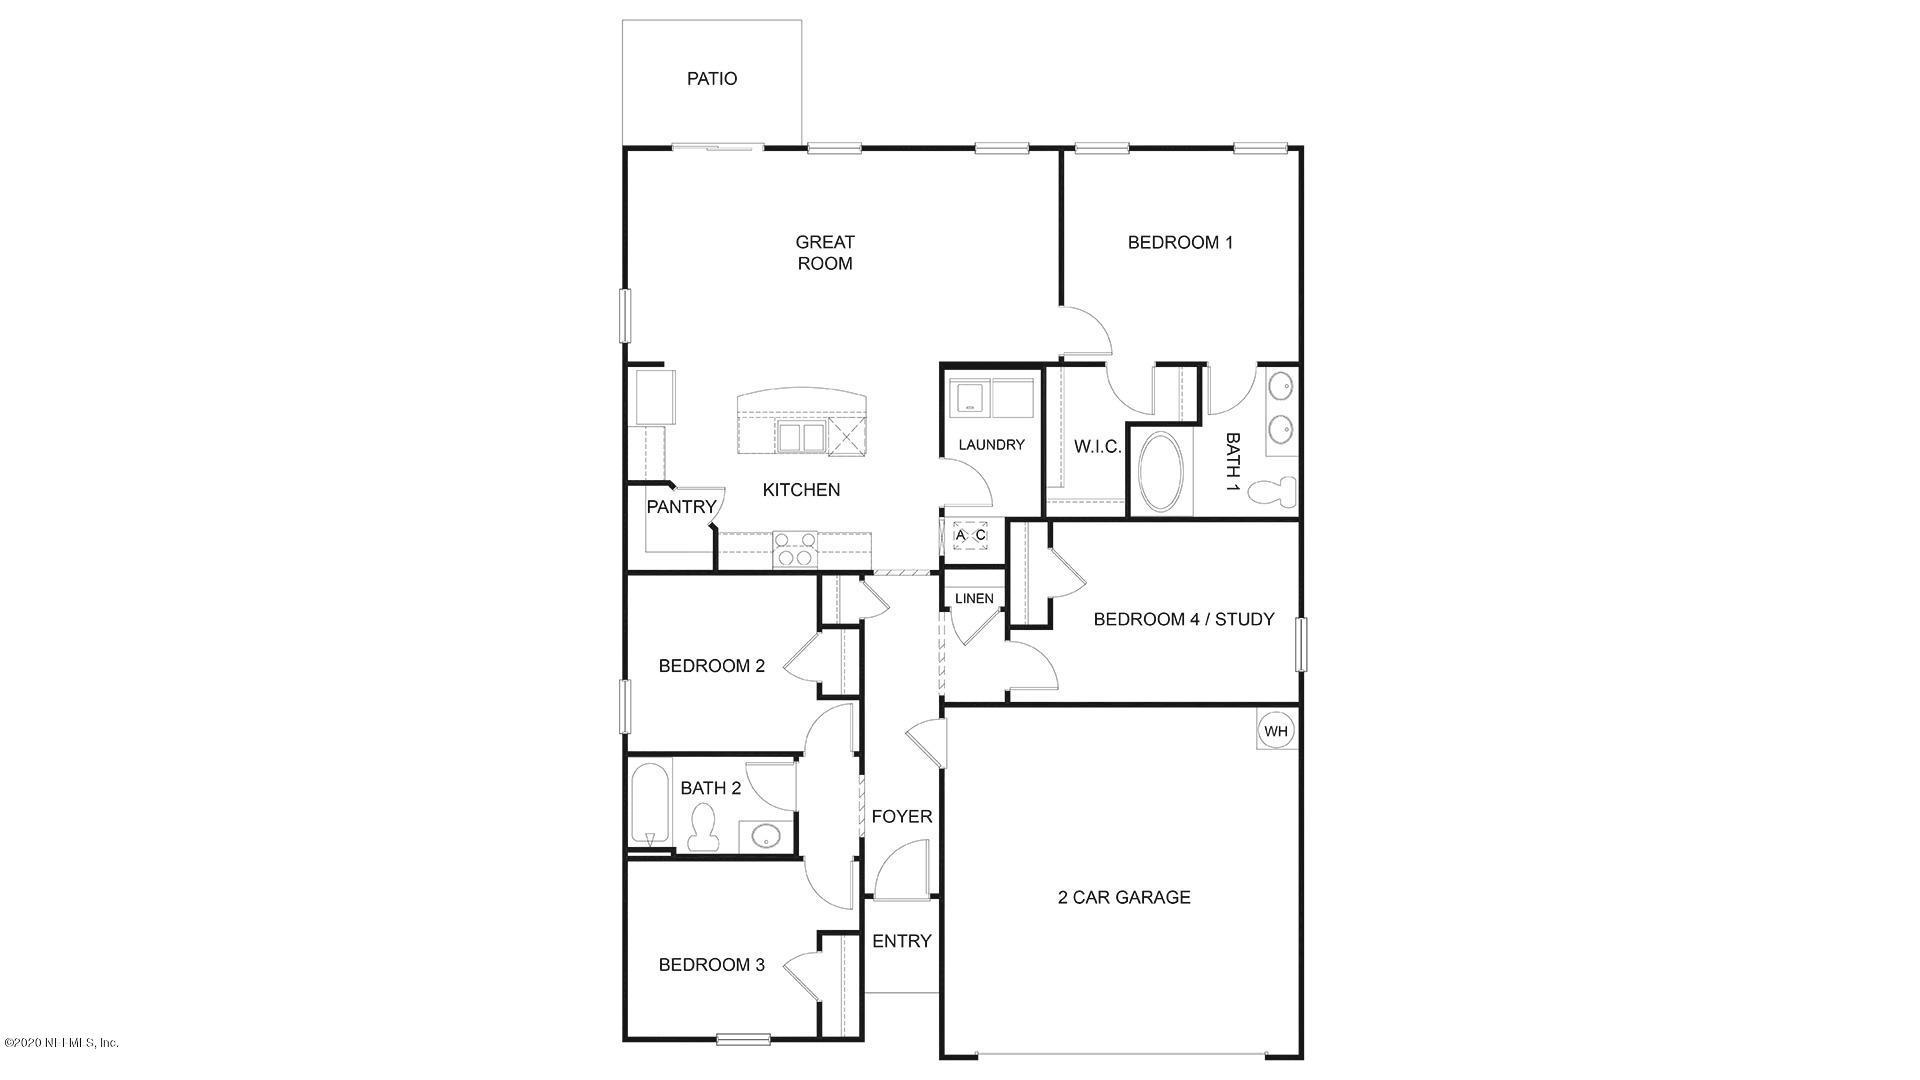 6427 BUCKING BRONCO, JACKSONVILLE, FLORIDA 32234, 4 Bedrooms Bedrooms, ,2 BathroomsBathrooms,Residential,For sale,BUCKING BRONCO,1080533